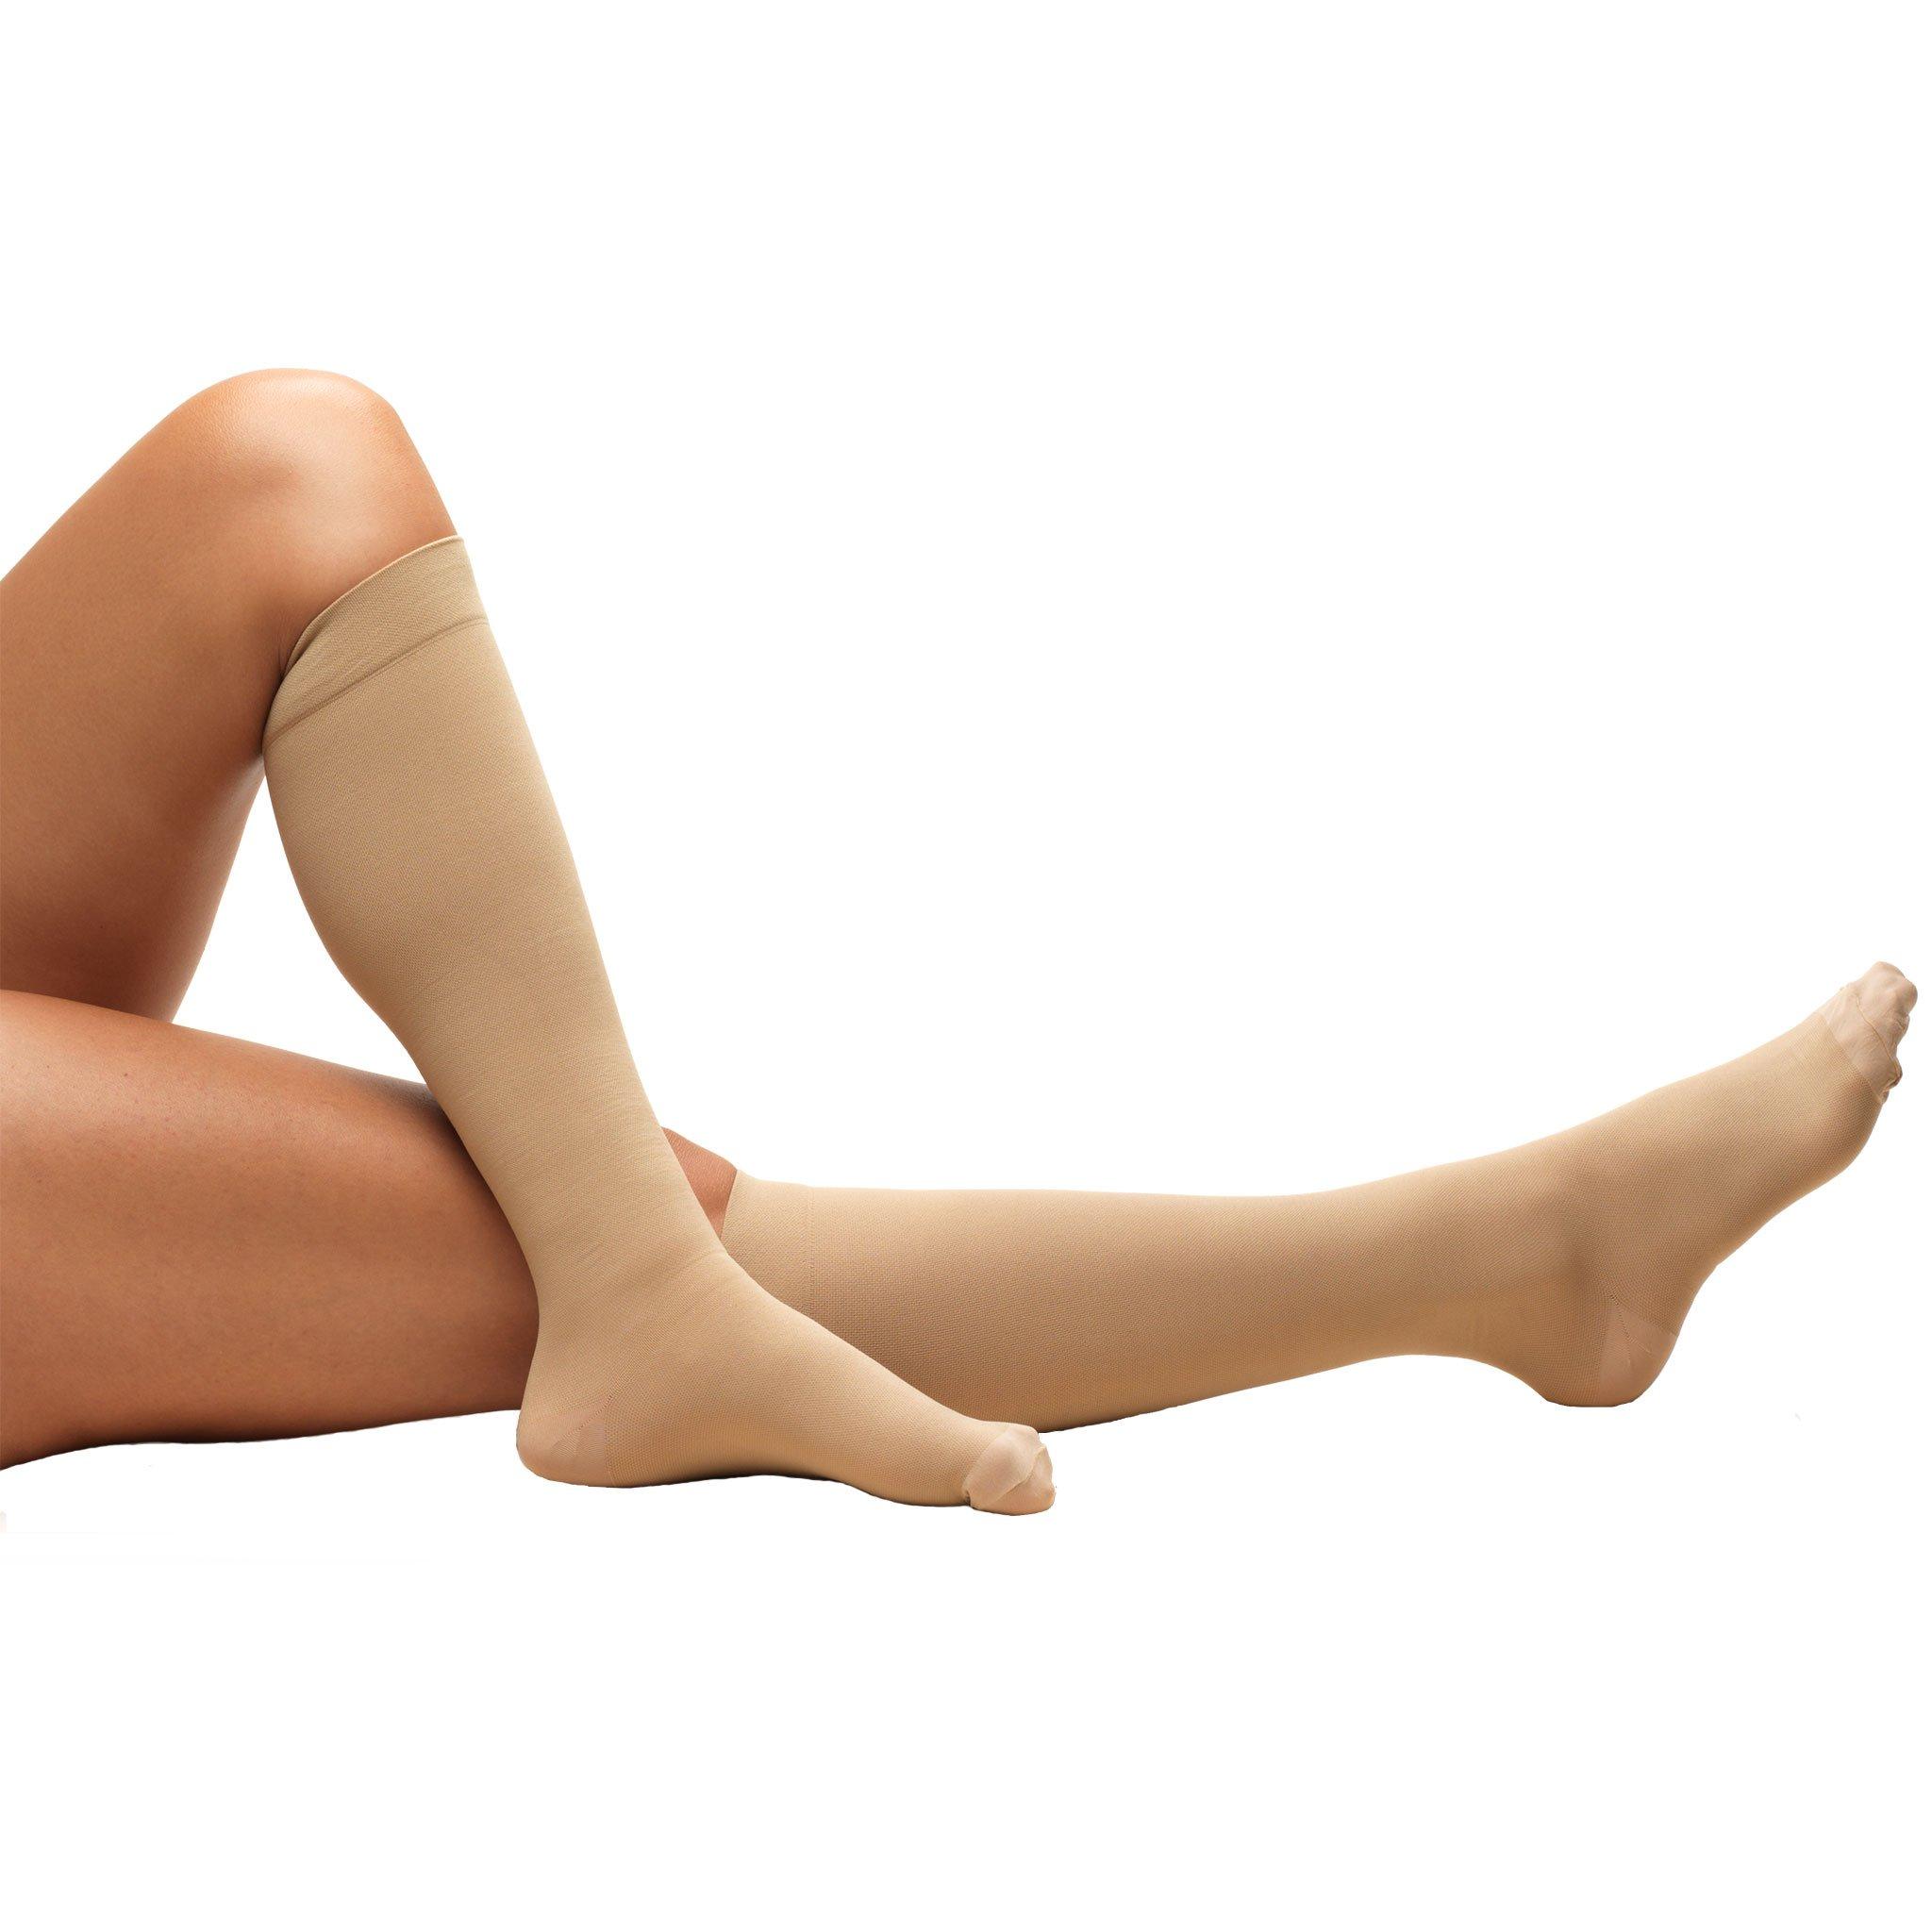 Truform Classic Medical Style Compression Stockings, Beige, Medium, Pair